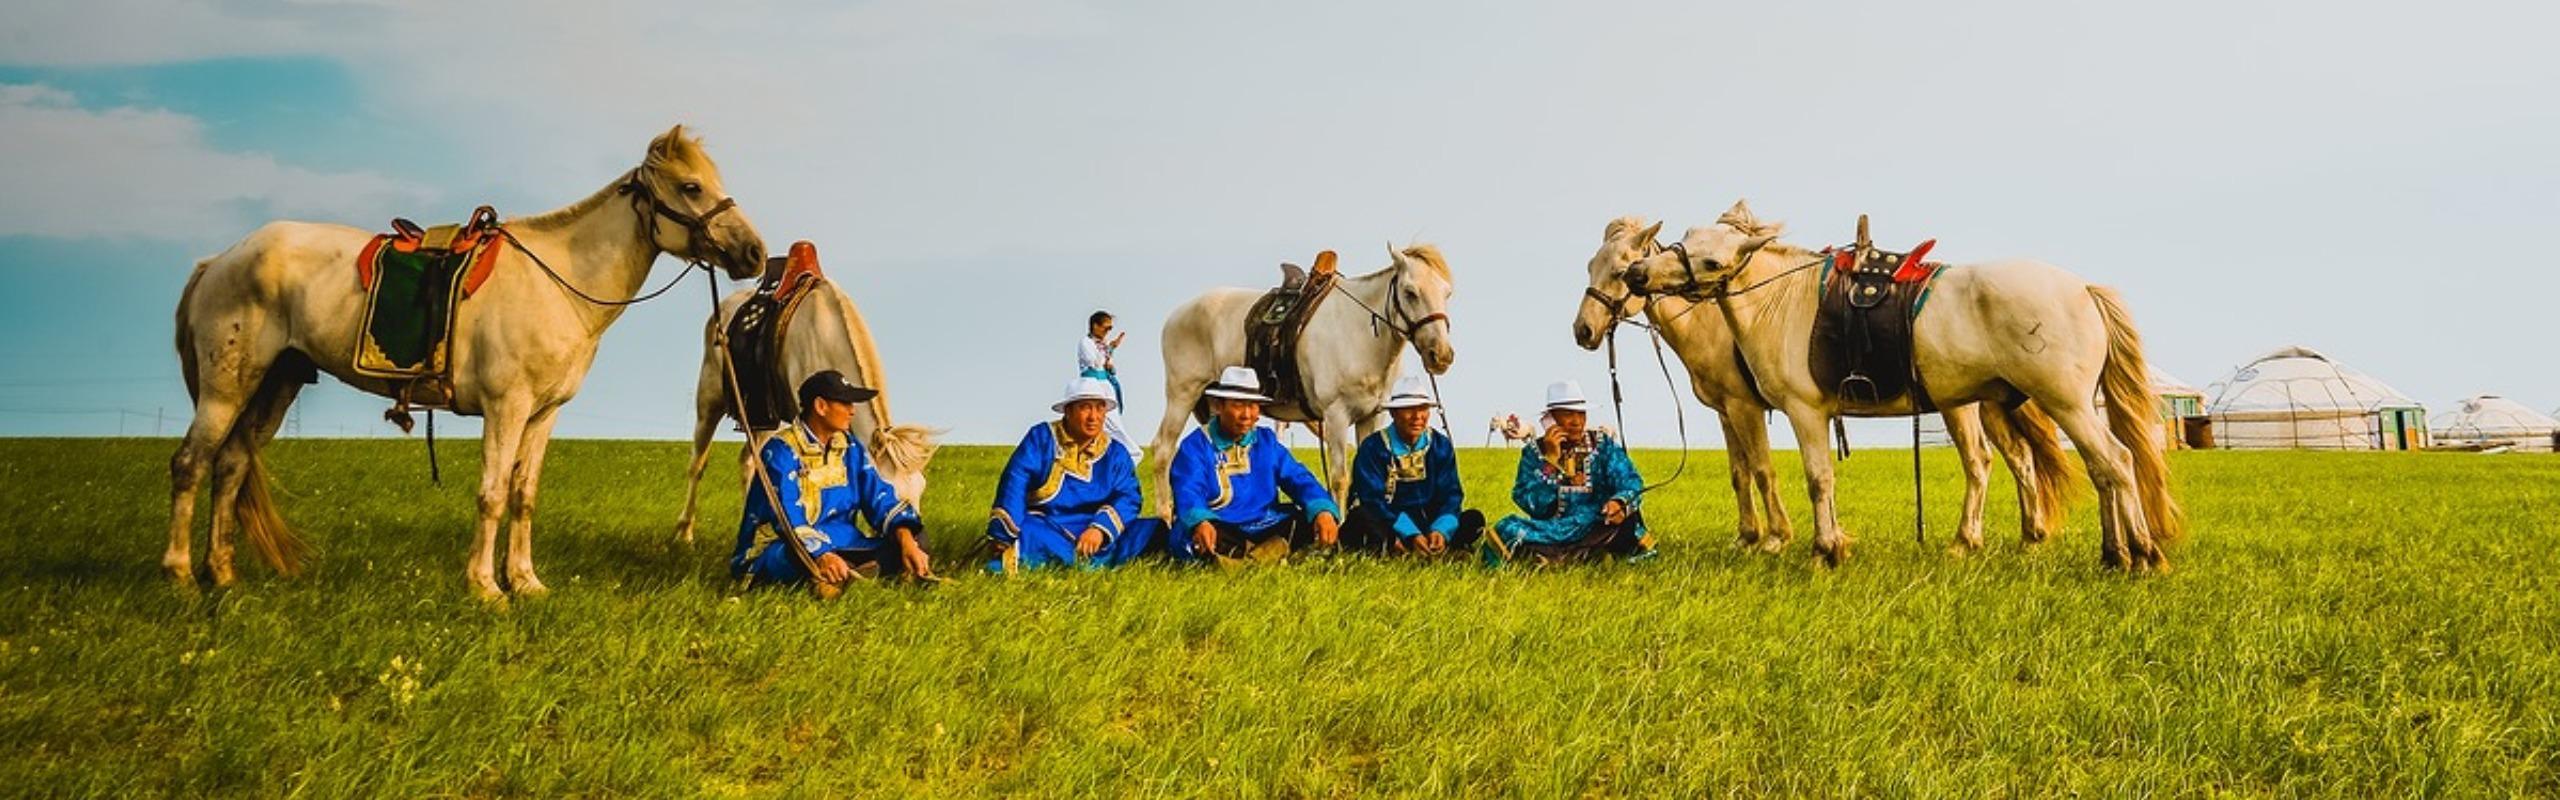 4-Day Xilingol Inner Mongolia Grassland Life Tour